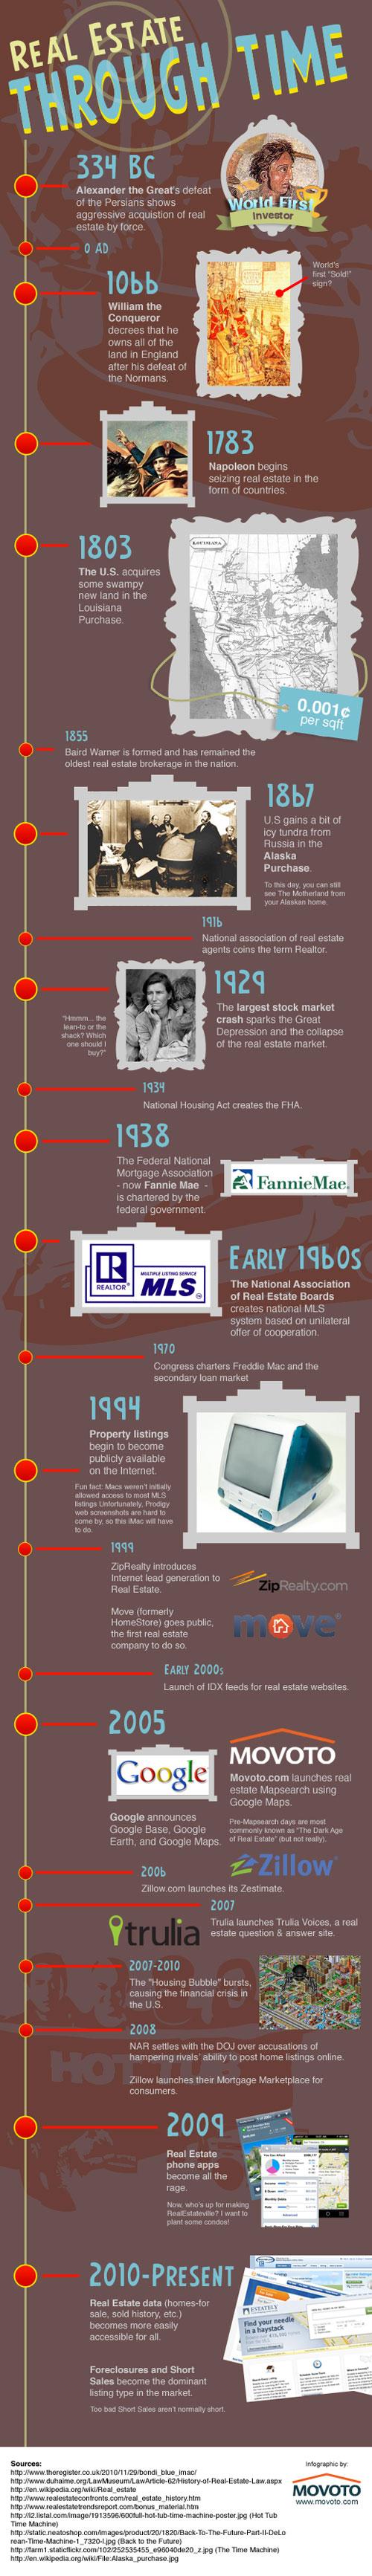 Real Estate Infographic Timeline